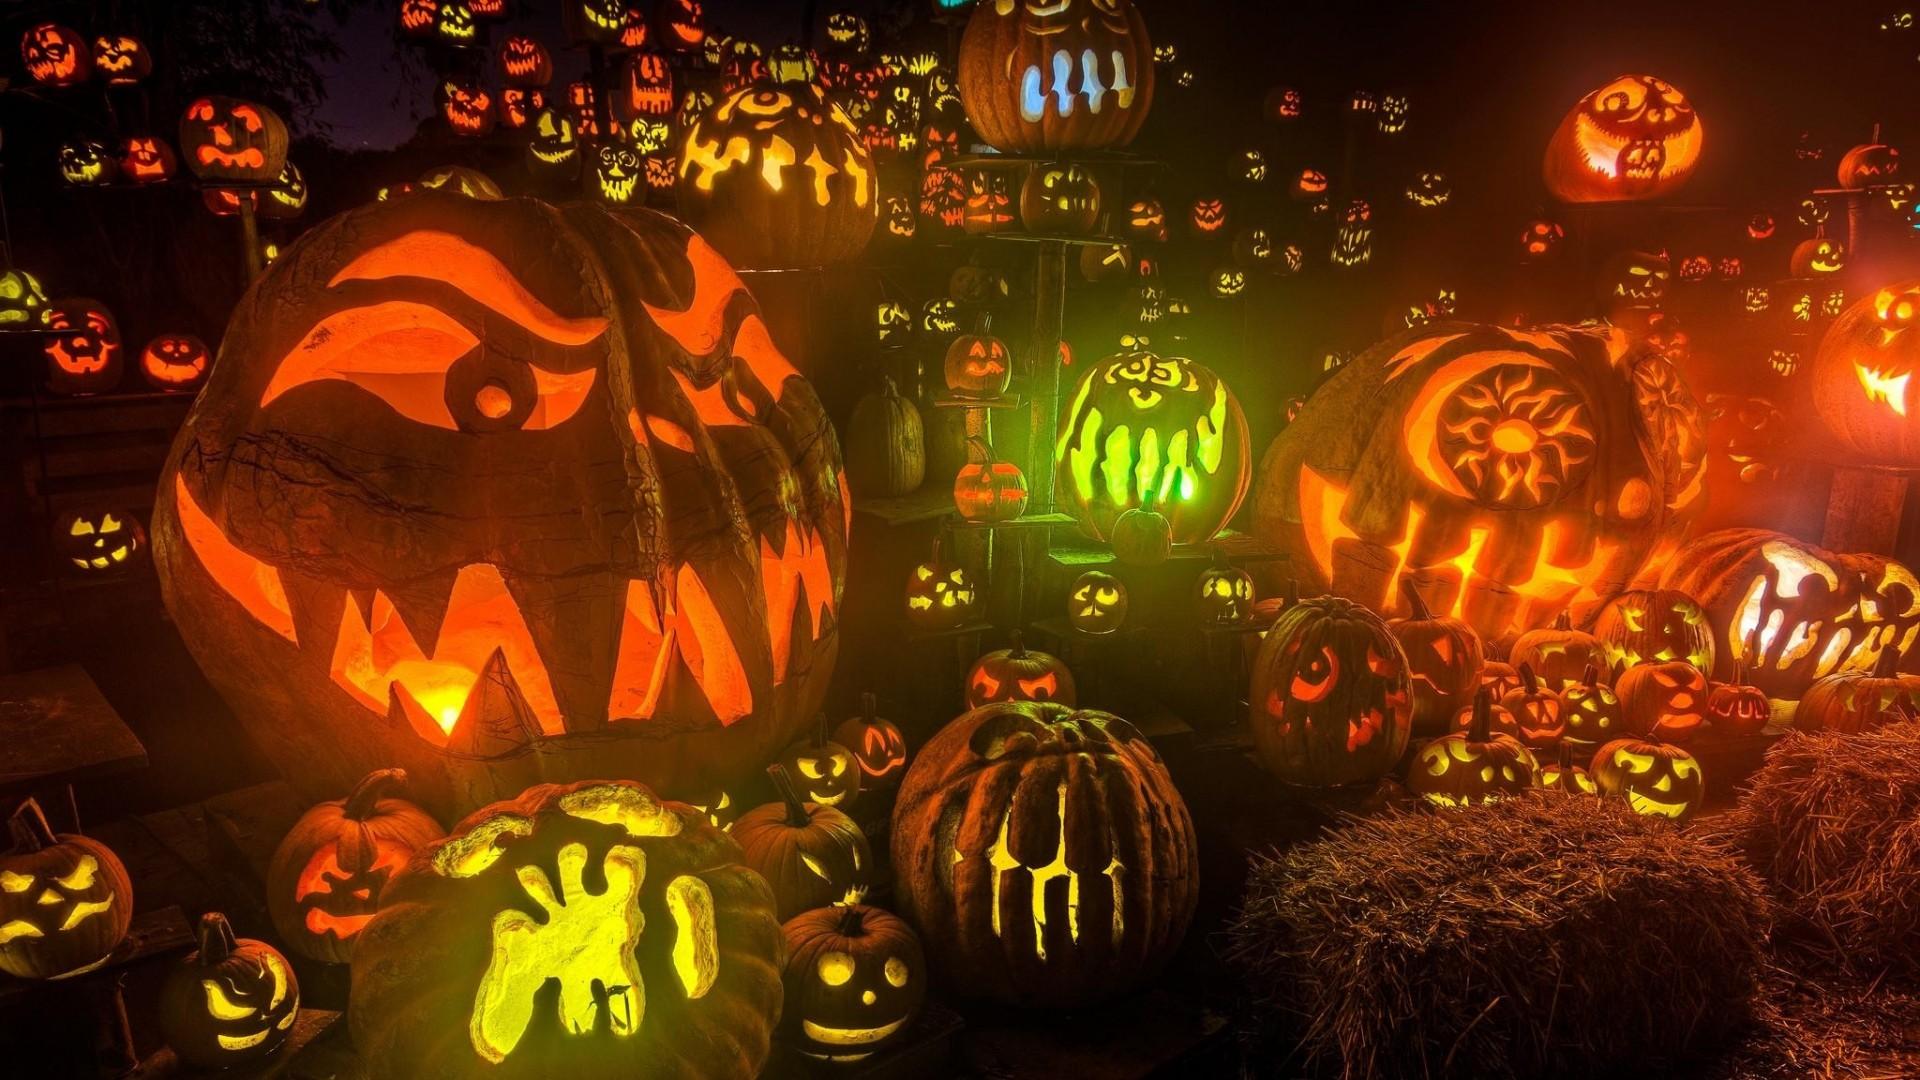 HD Halloween Wallpapers 1080p – WallpaperSafari